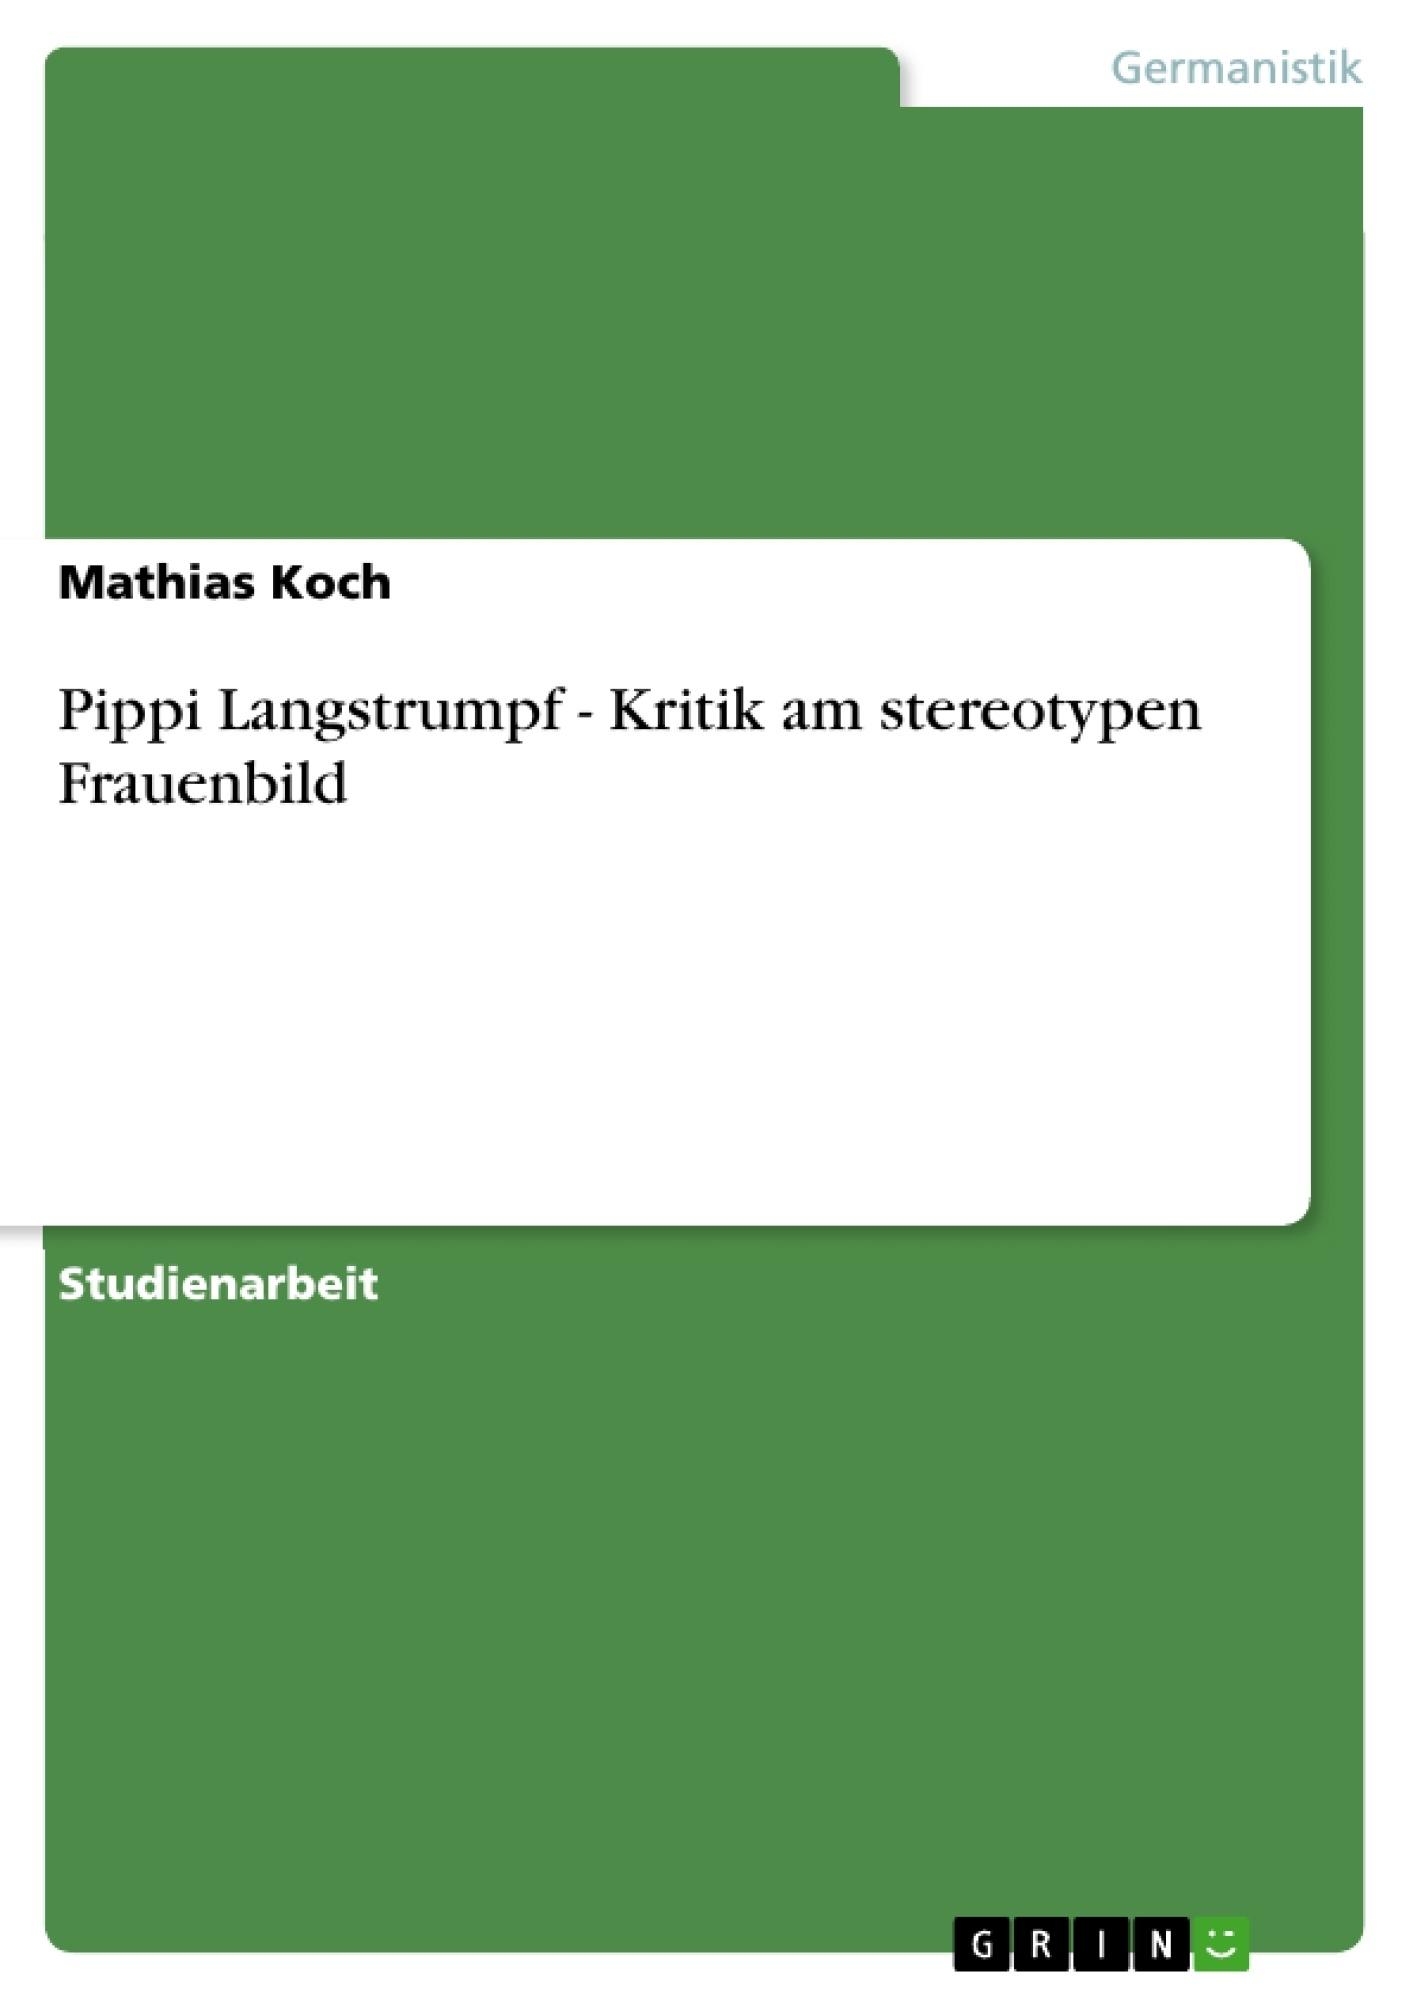 Titel: Pippi Langstrumpf - Kritik am stereotypen Frauenbild